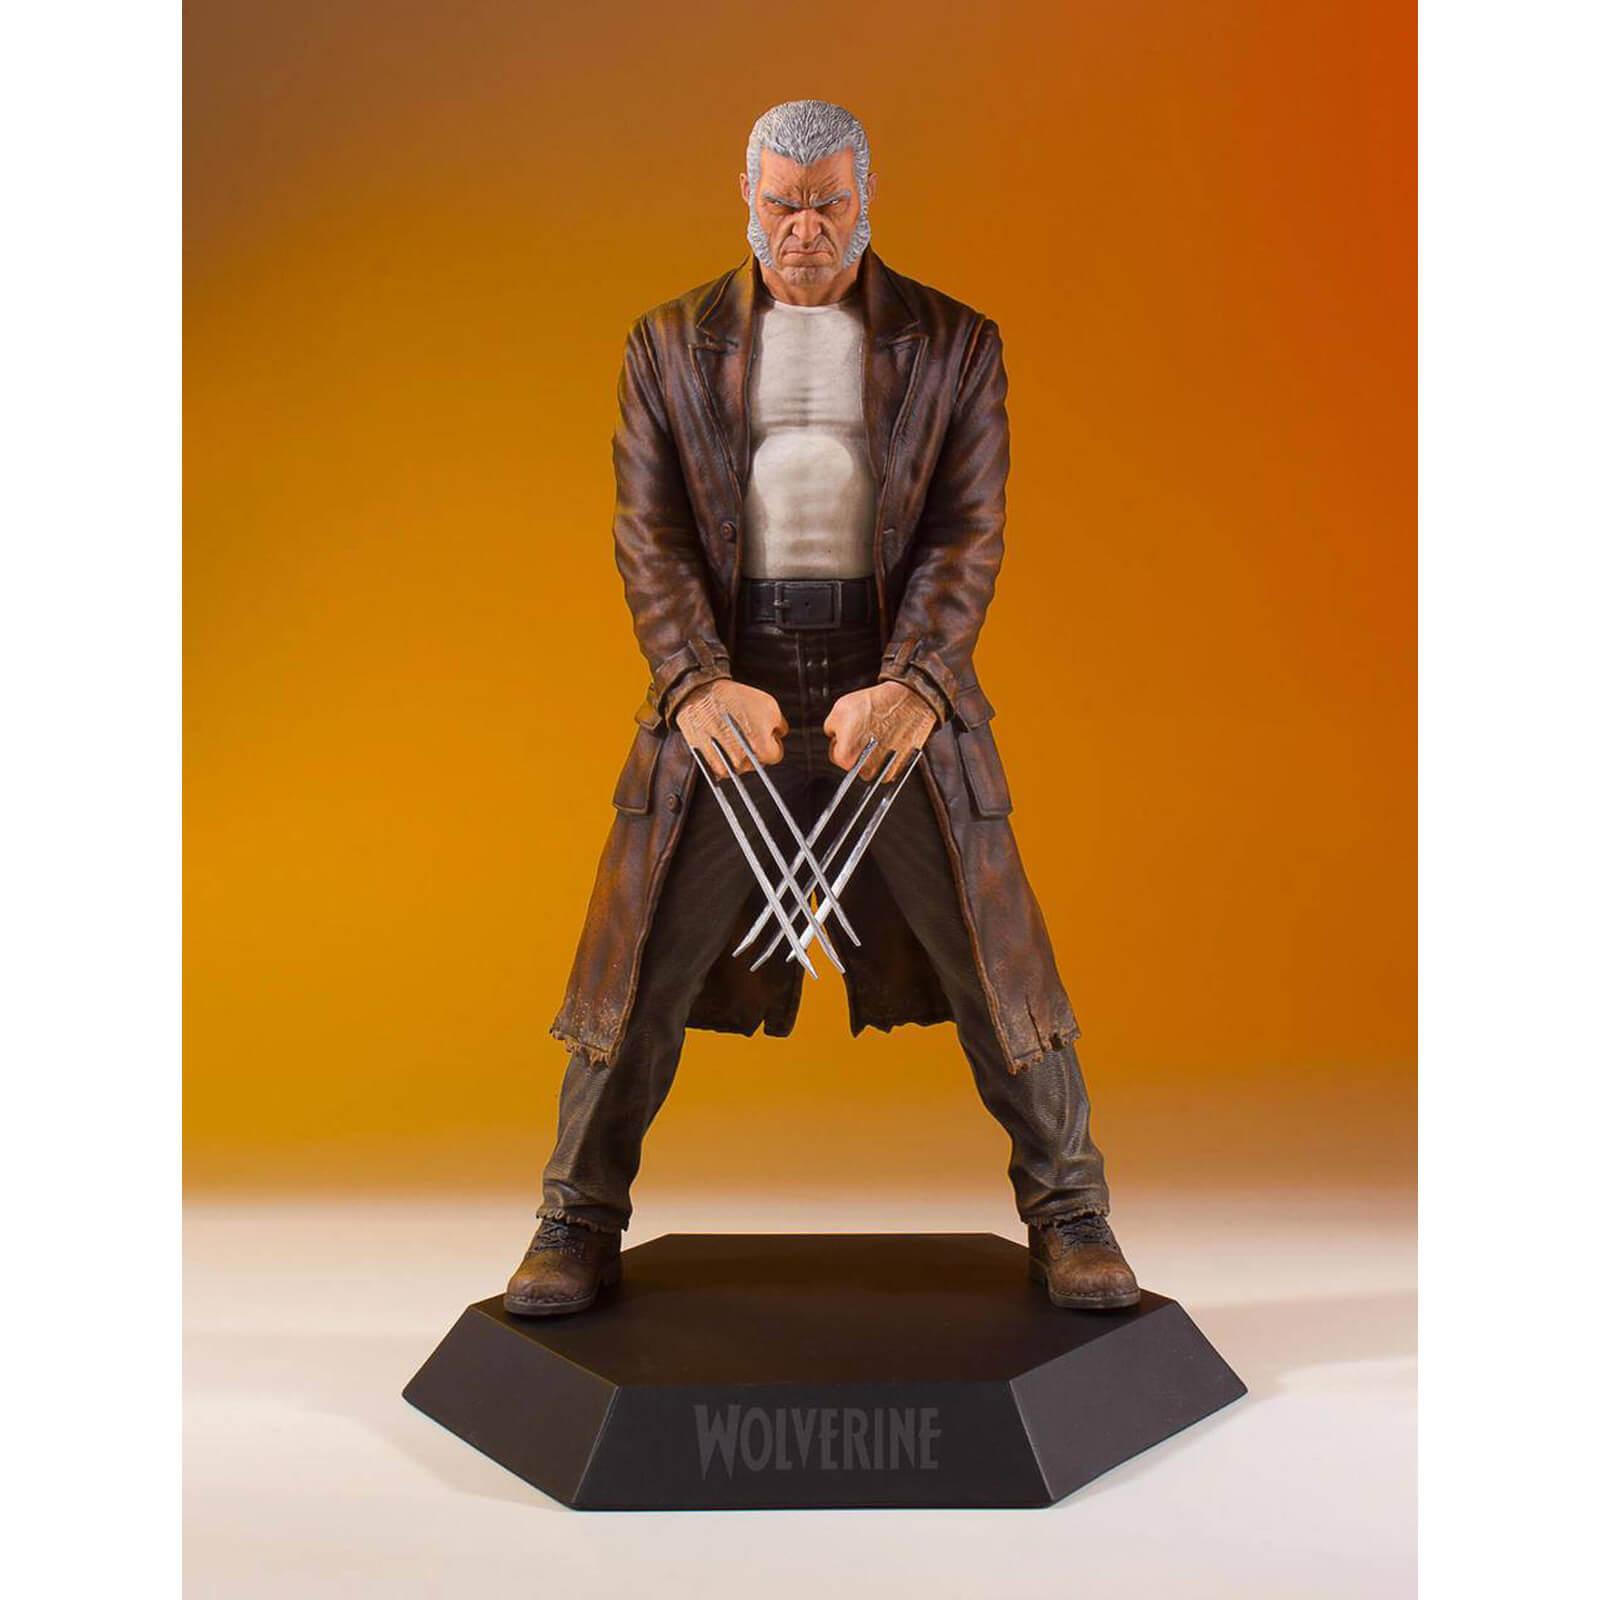 8ad5347e0bda7 Marvel Comics Wolverine 08 Old Man Logan 1 8 Collector s Gallery Statue  22cm Merchandise